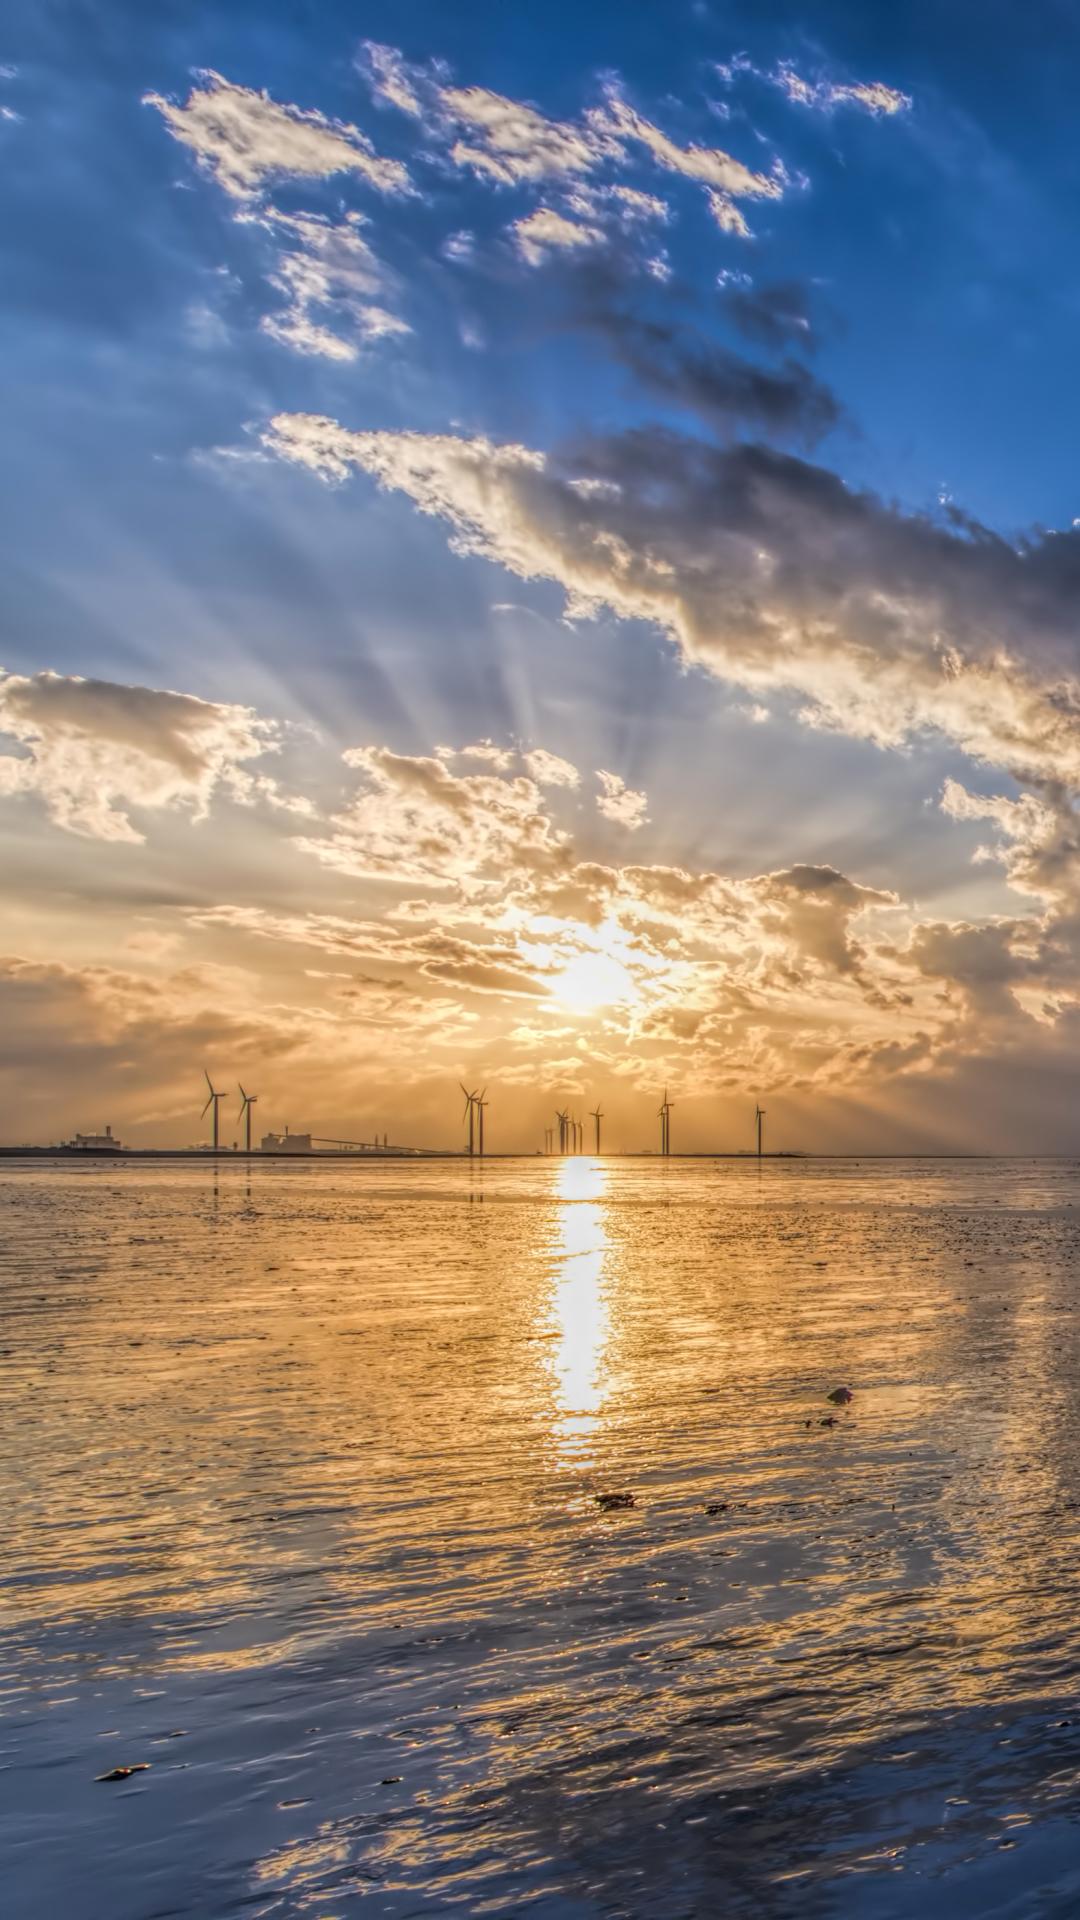 ... Reflection Horizon Sky Cloud Wind Turbine Sunbeam Mobile Wallpaper